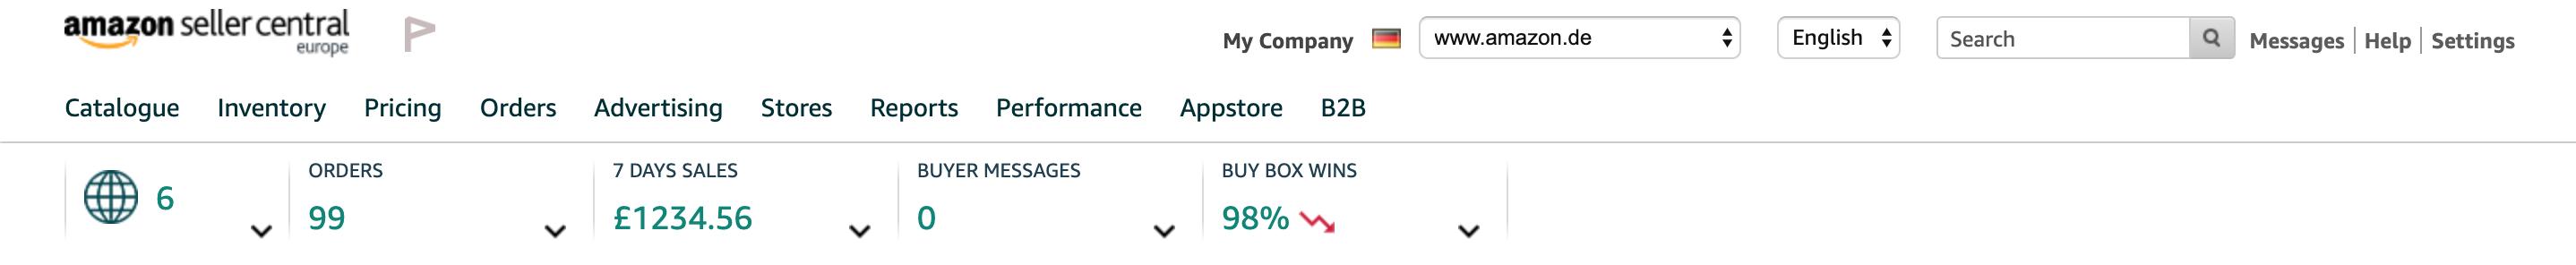 Buy Box win percentage